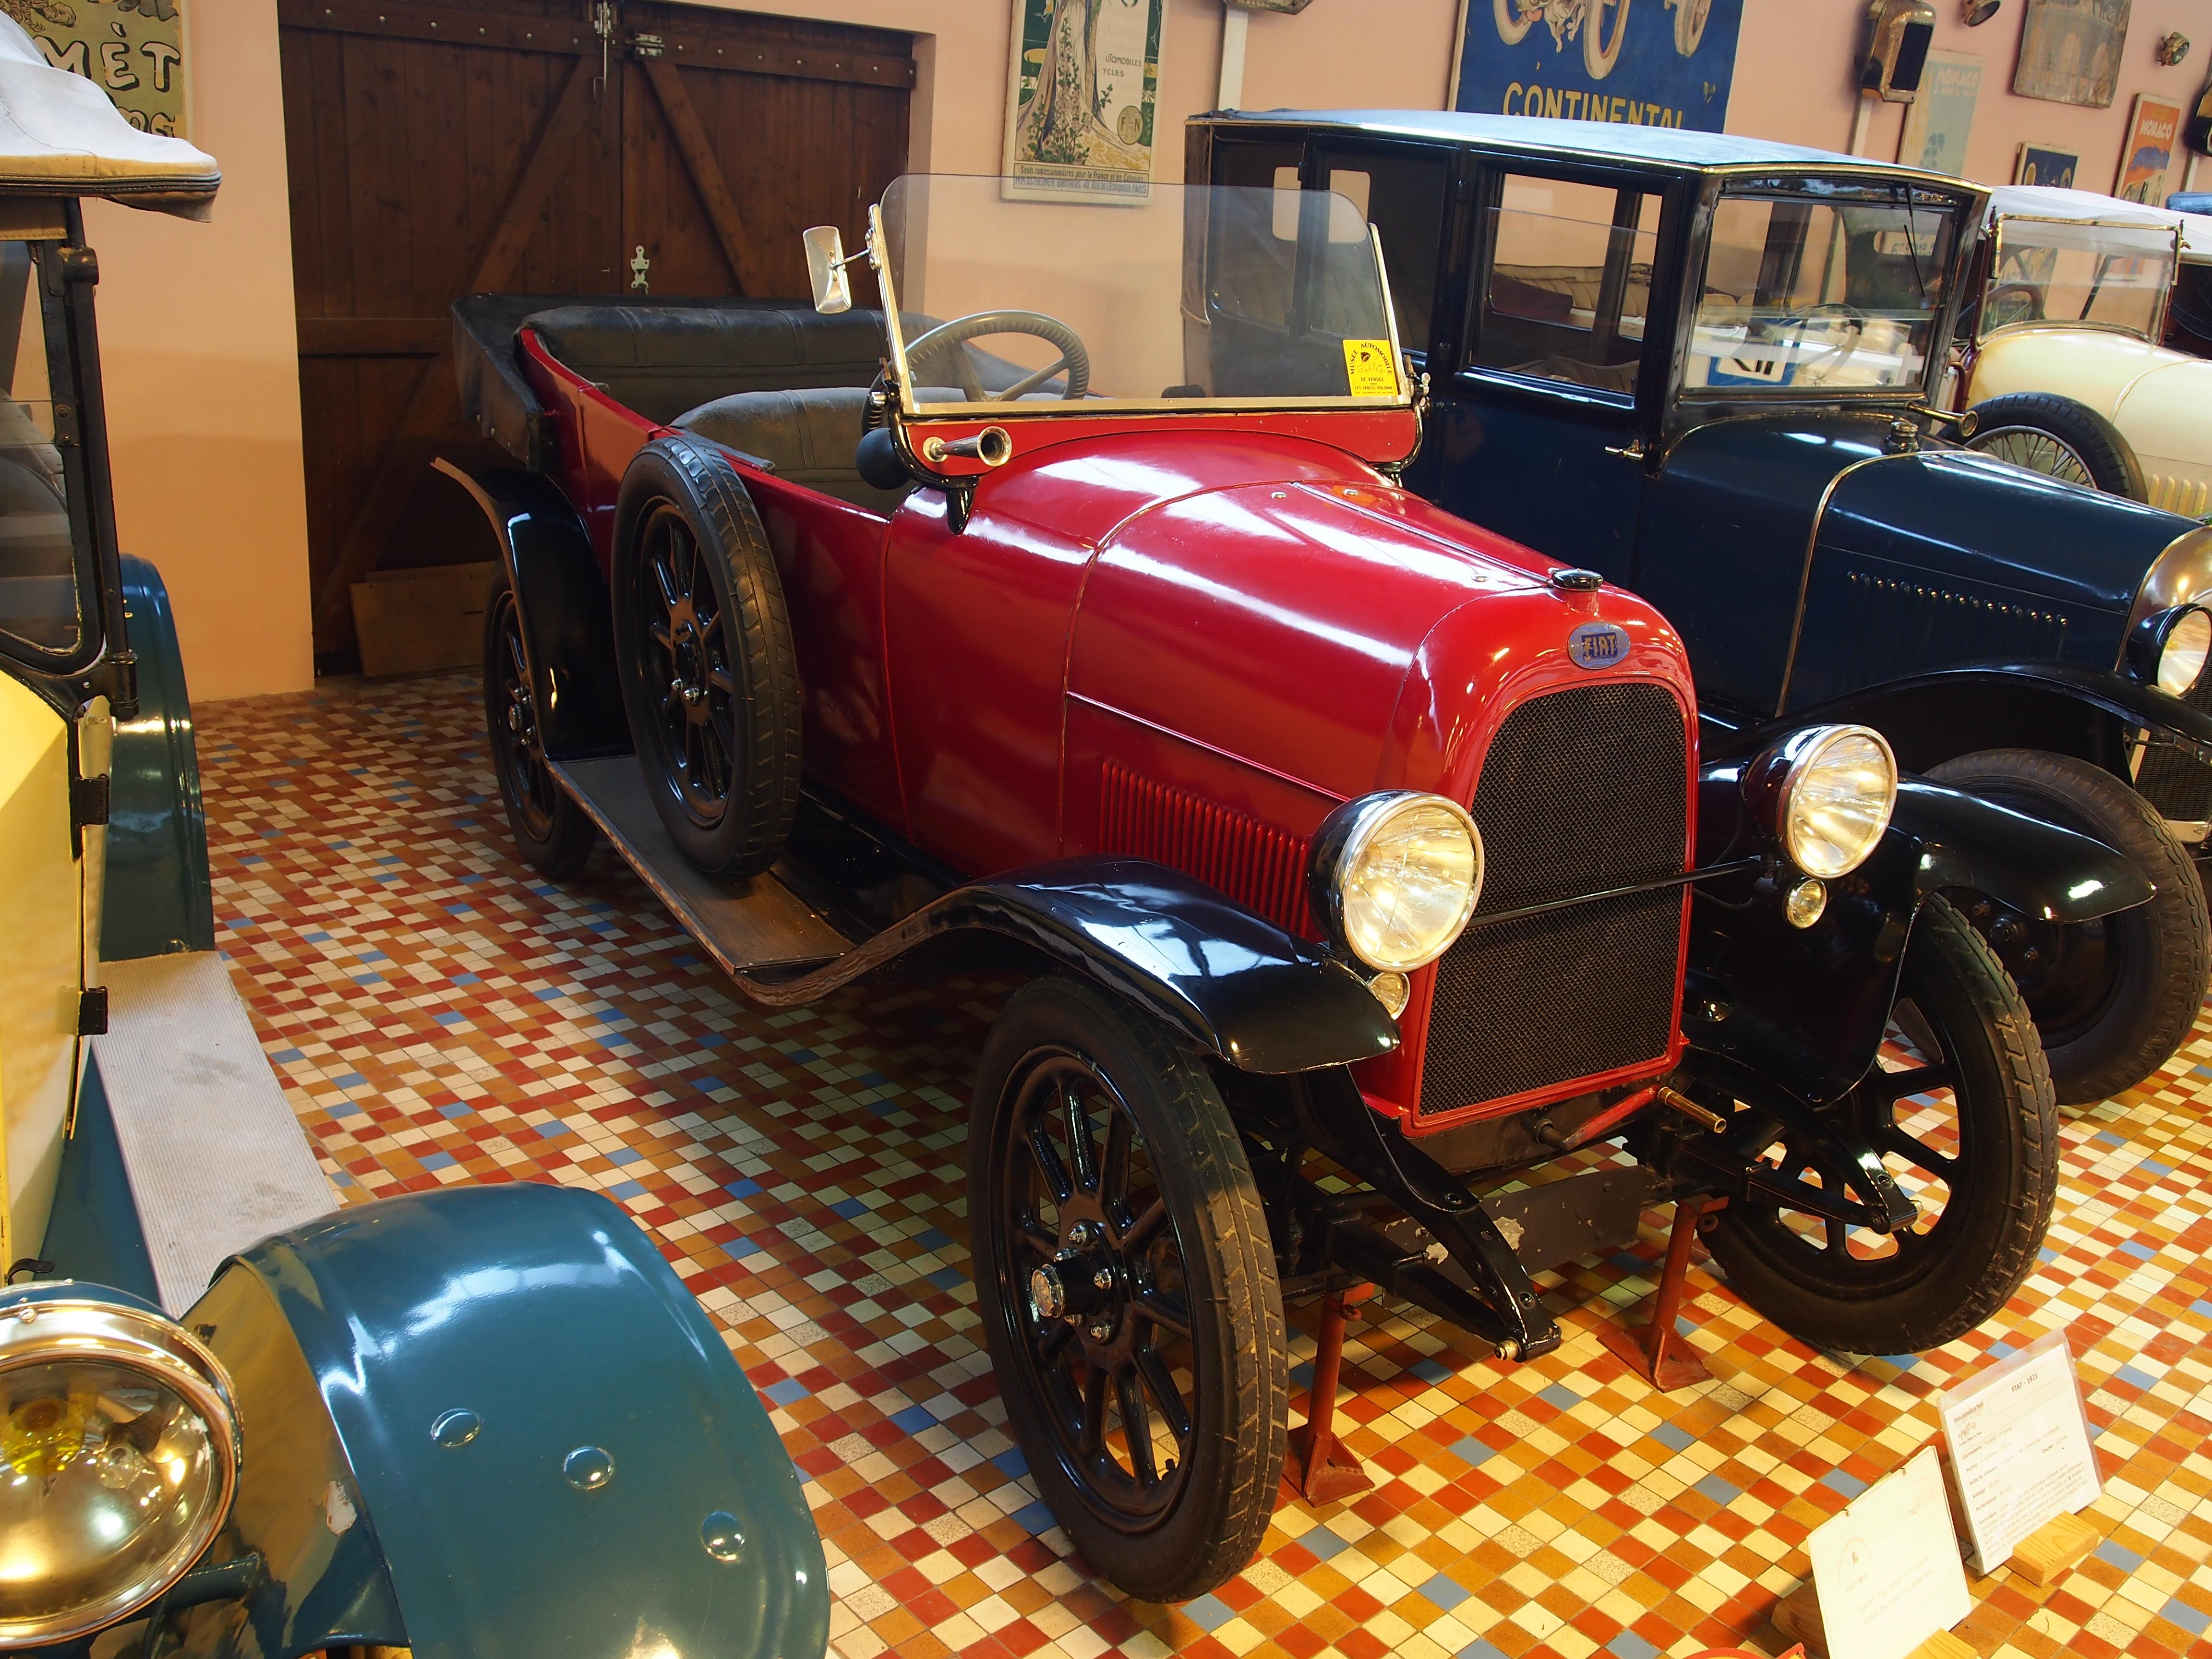 file 1921 fiat 501 torpedo 10cv 1450cc 4cyl at the mus e automobile de vend e pic 5 jpg. Black Bedroom Furniture Sets. Home Design Ideas